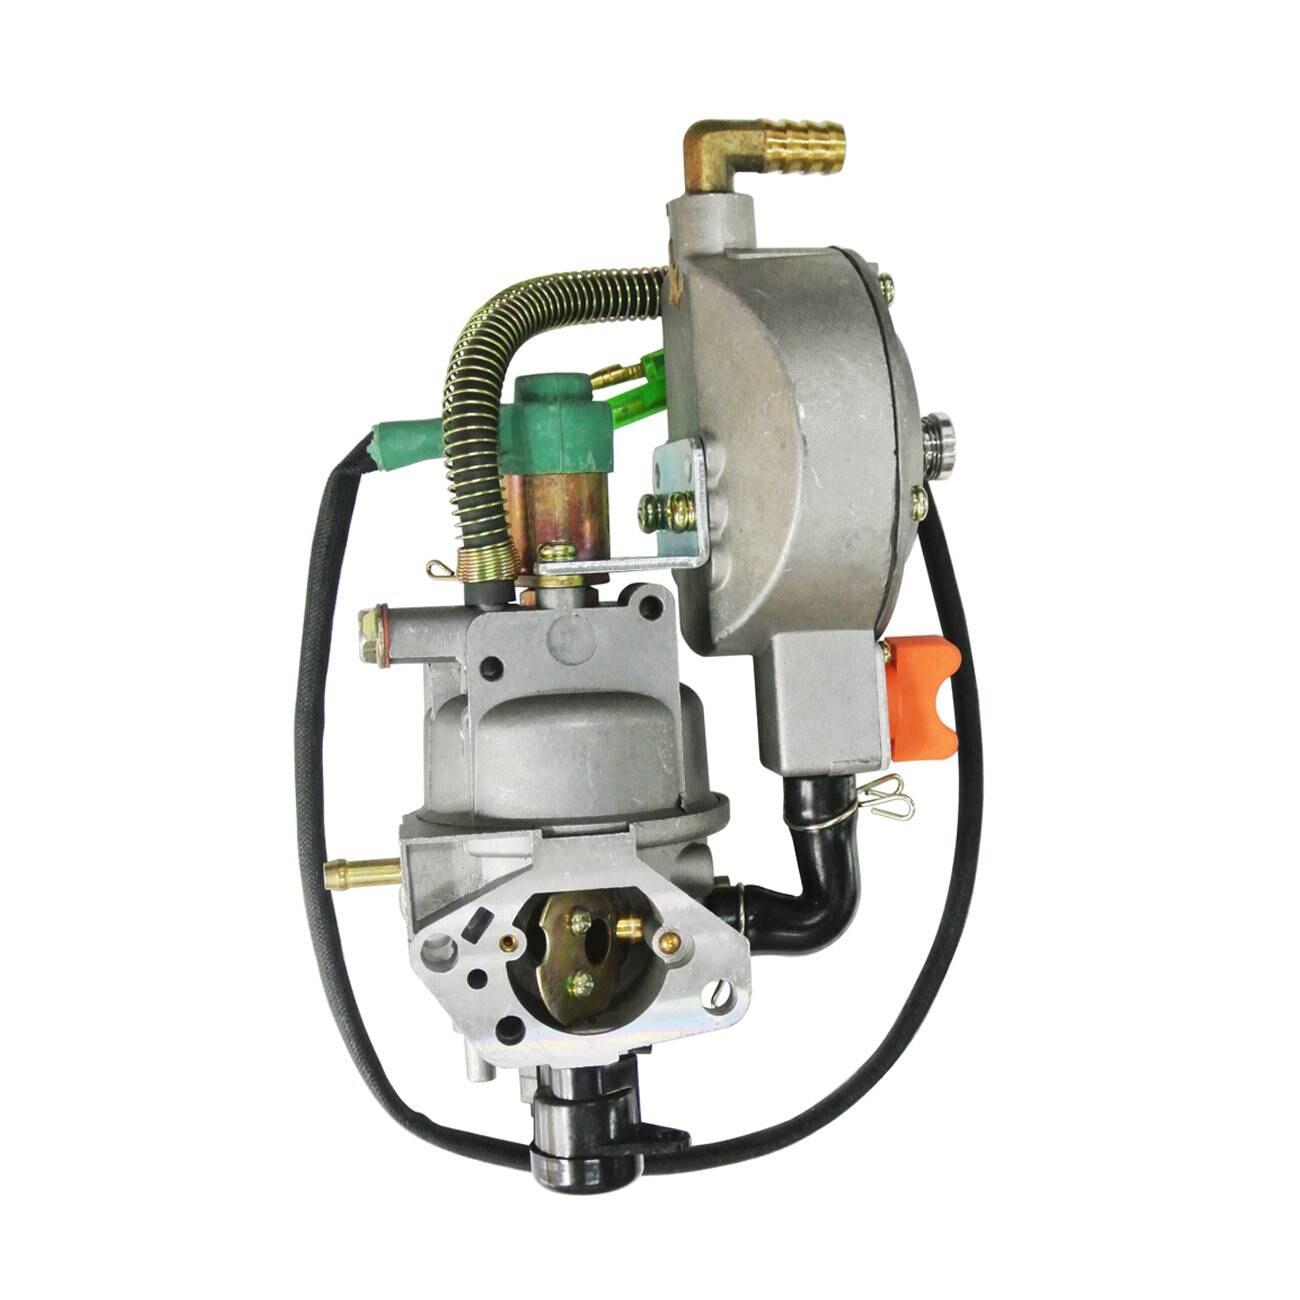 Carburetor Carb For Honda Gx390 188f 13hp Gx340 11hp Generator